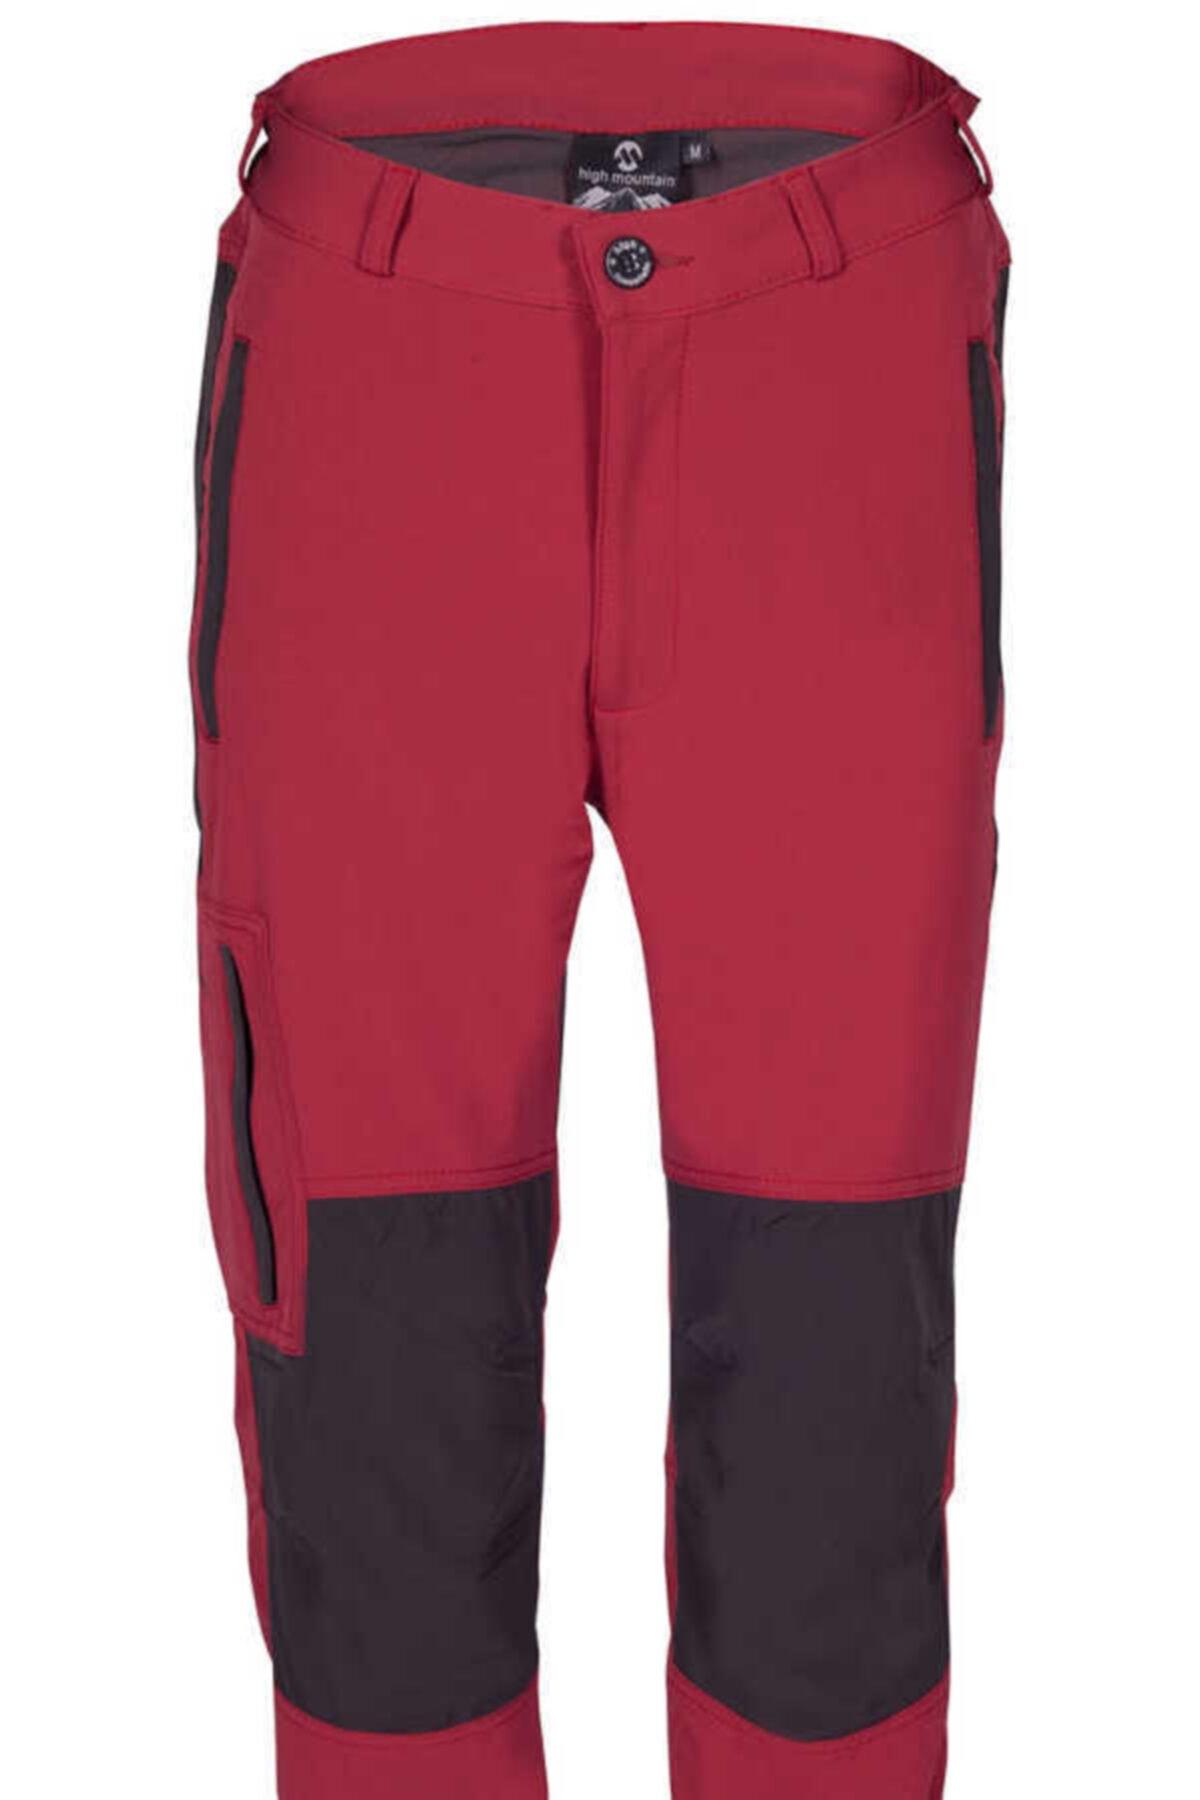 High Mountain Nepal Pantolon Kırmızı/antrasit 2